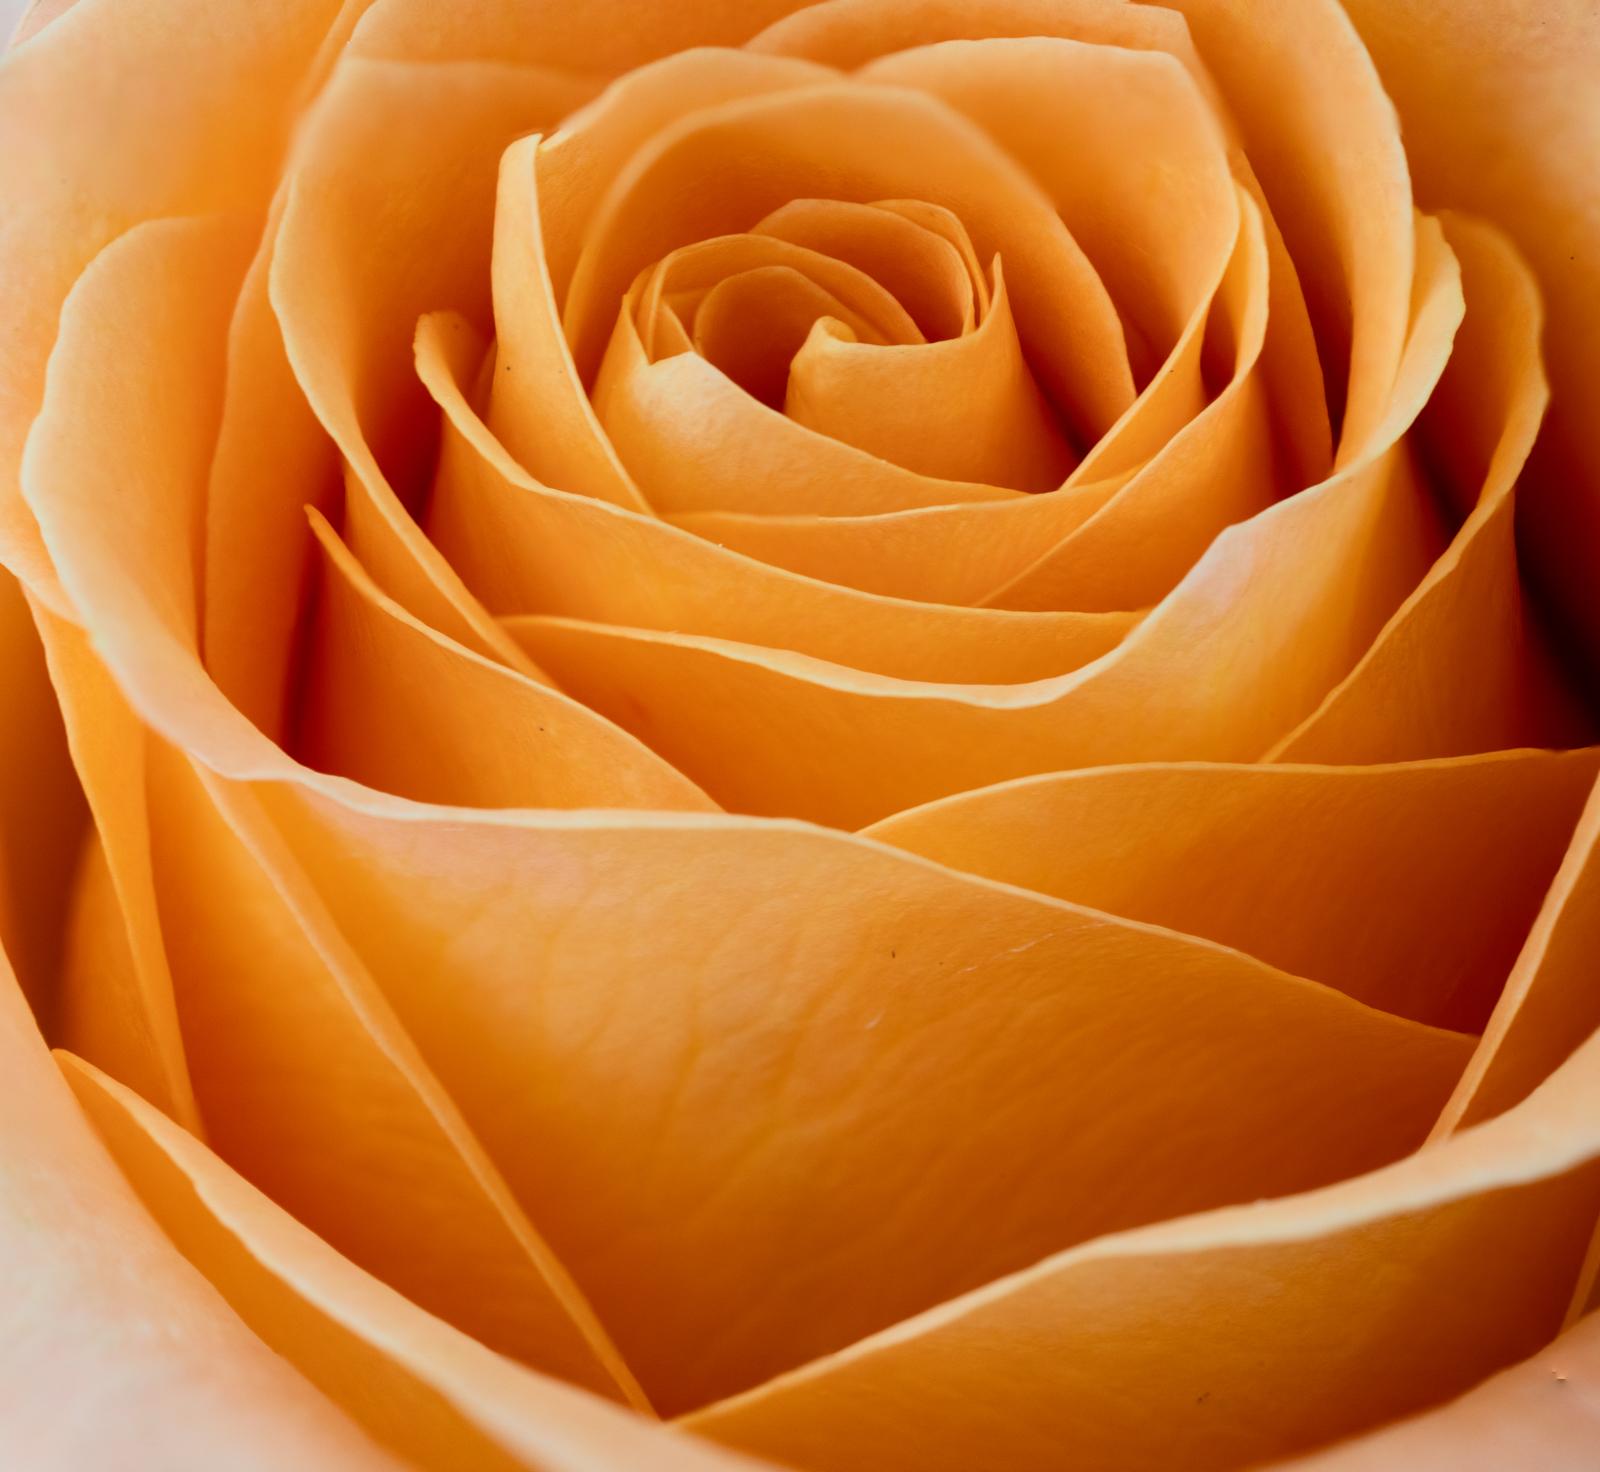 Rose 9 stack.jpg